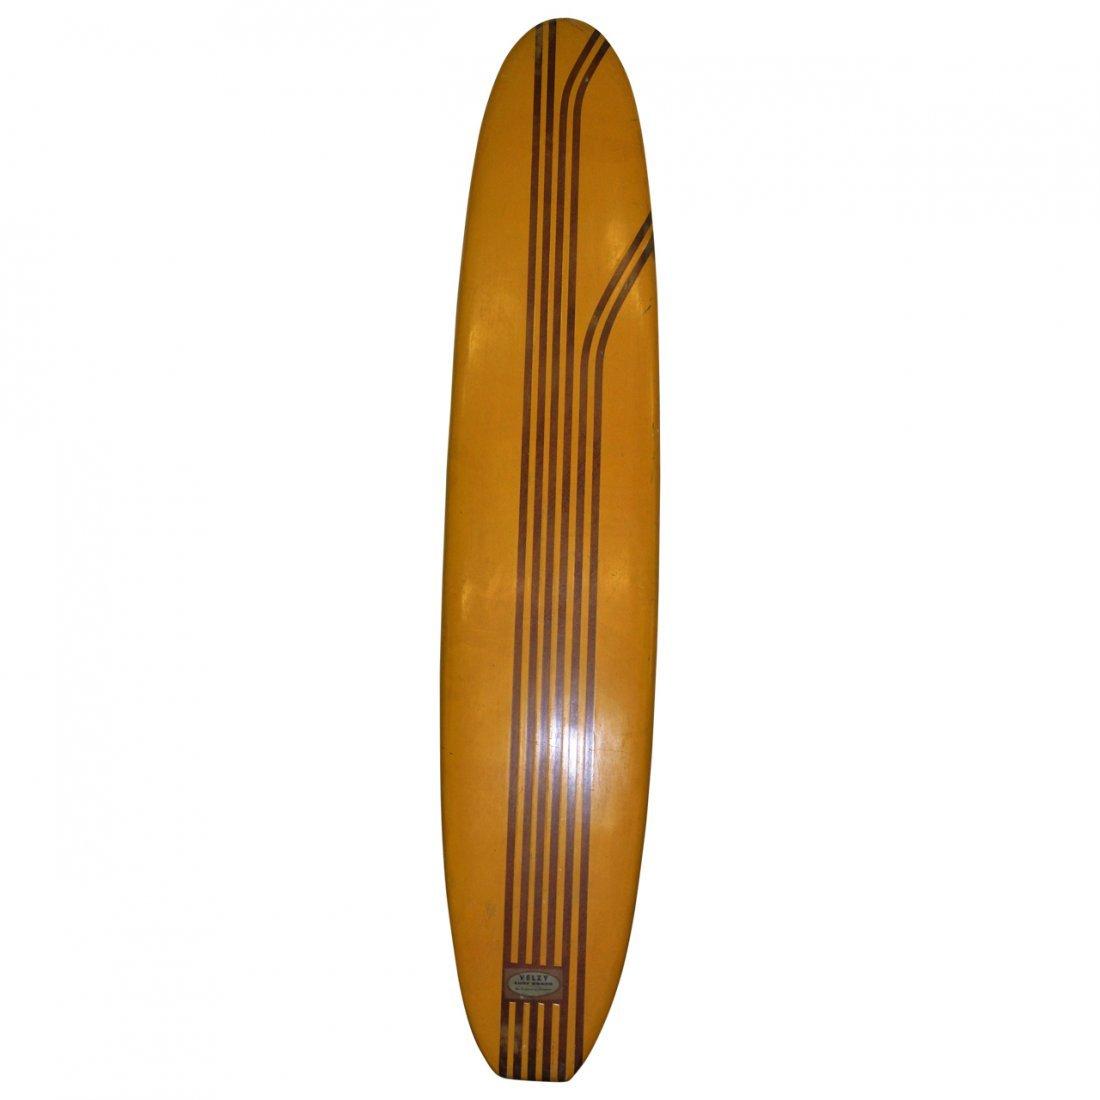 VIntage California  Velsy Surfboard 70's